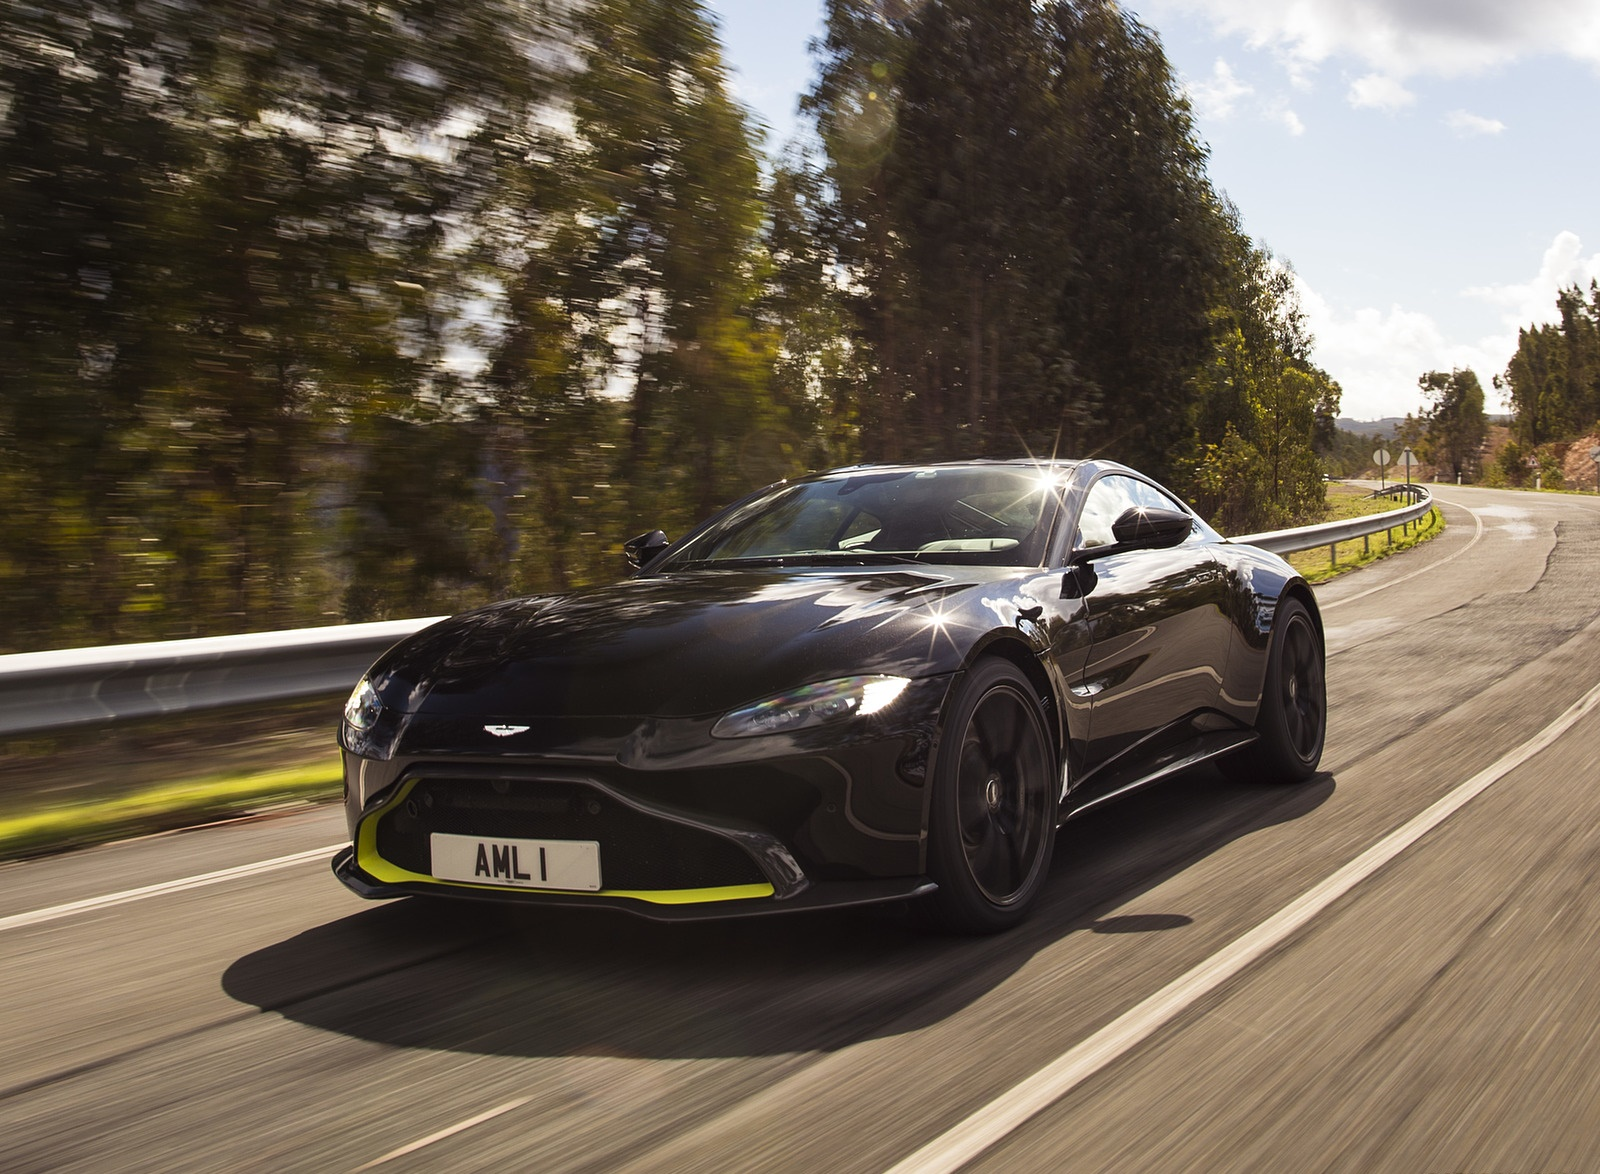 2019 Aston Martin Vantage (Onyx Black) Front Three-Quarter Wallpapers (2)